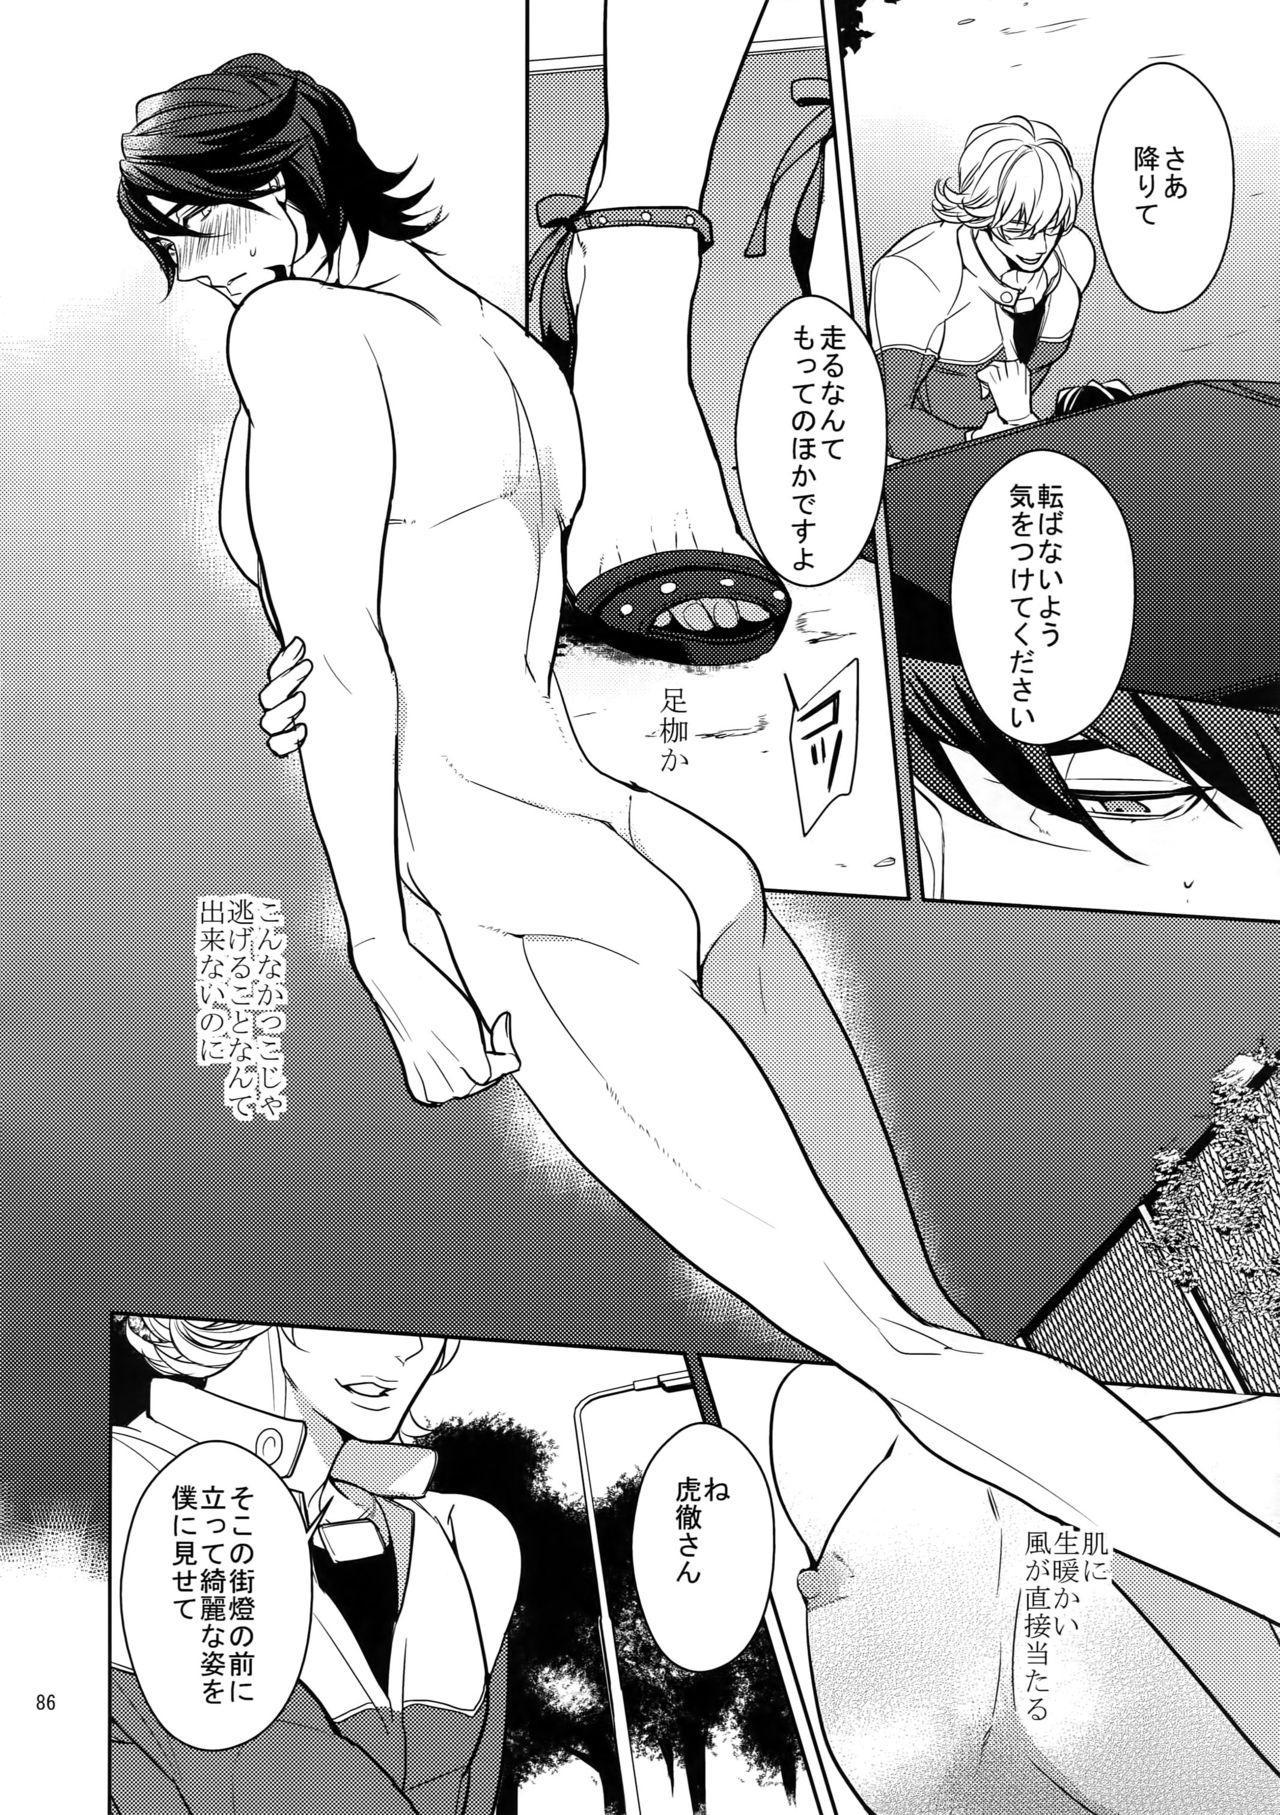 BOROZS Usagi Tora Sairoku 2 84